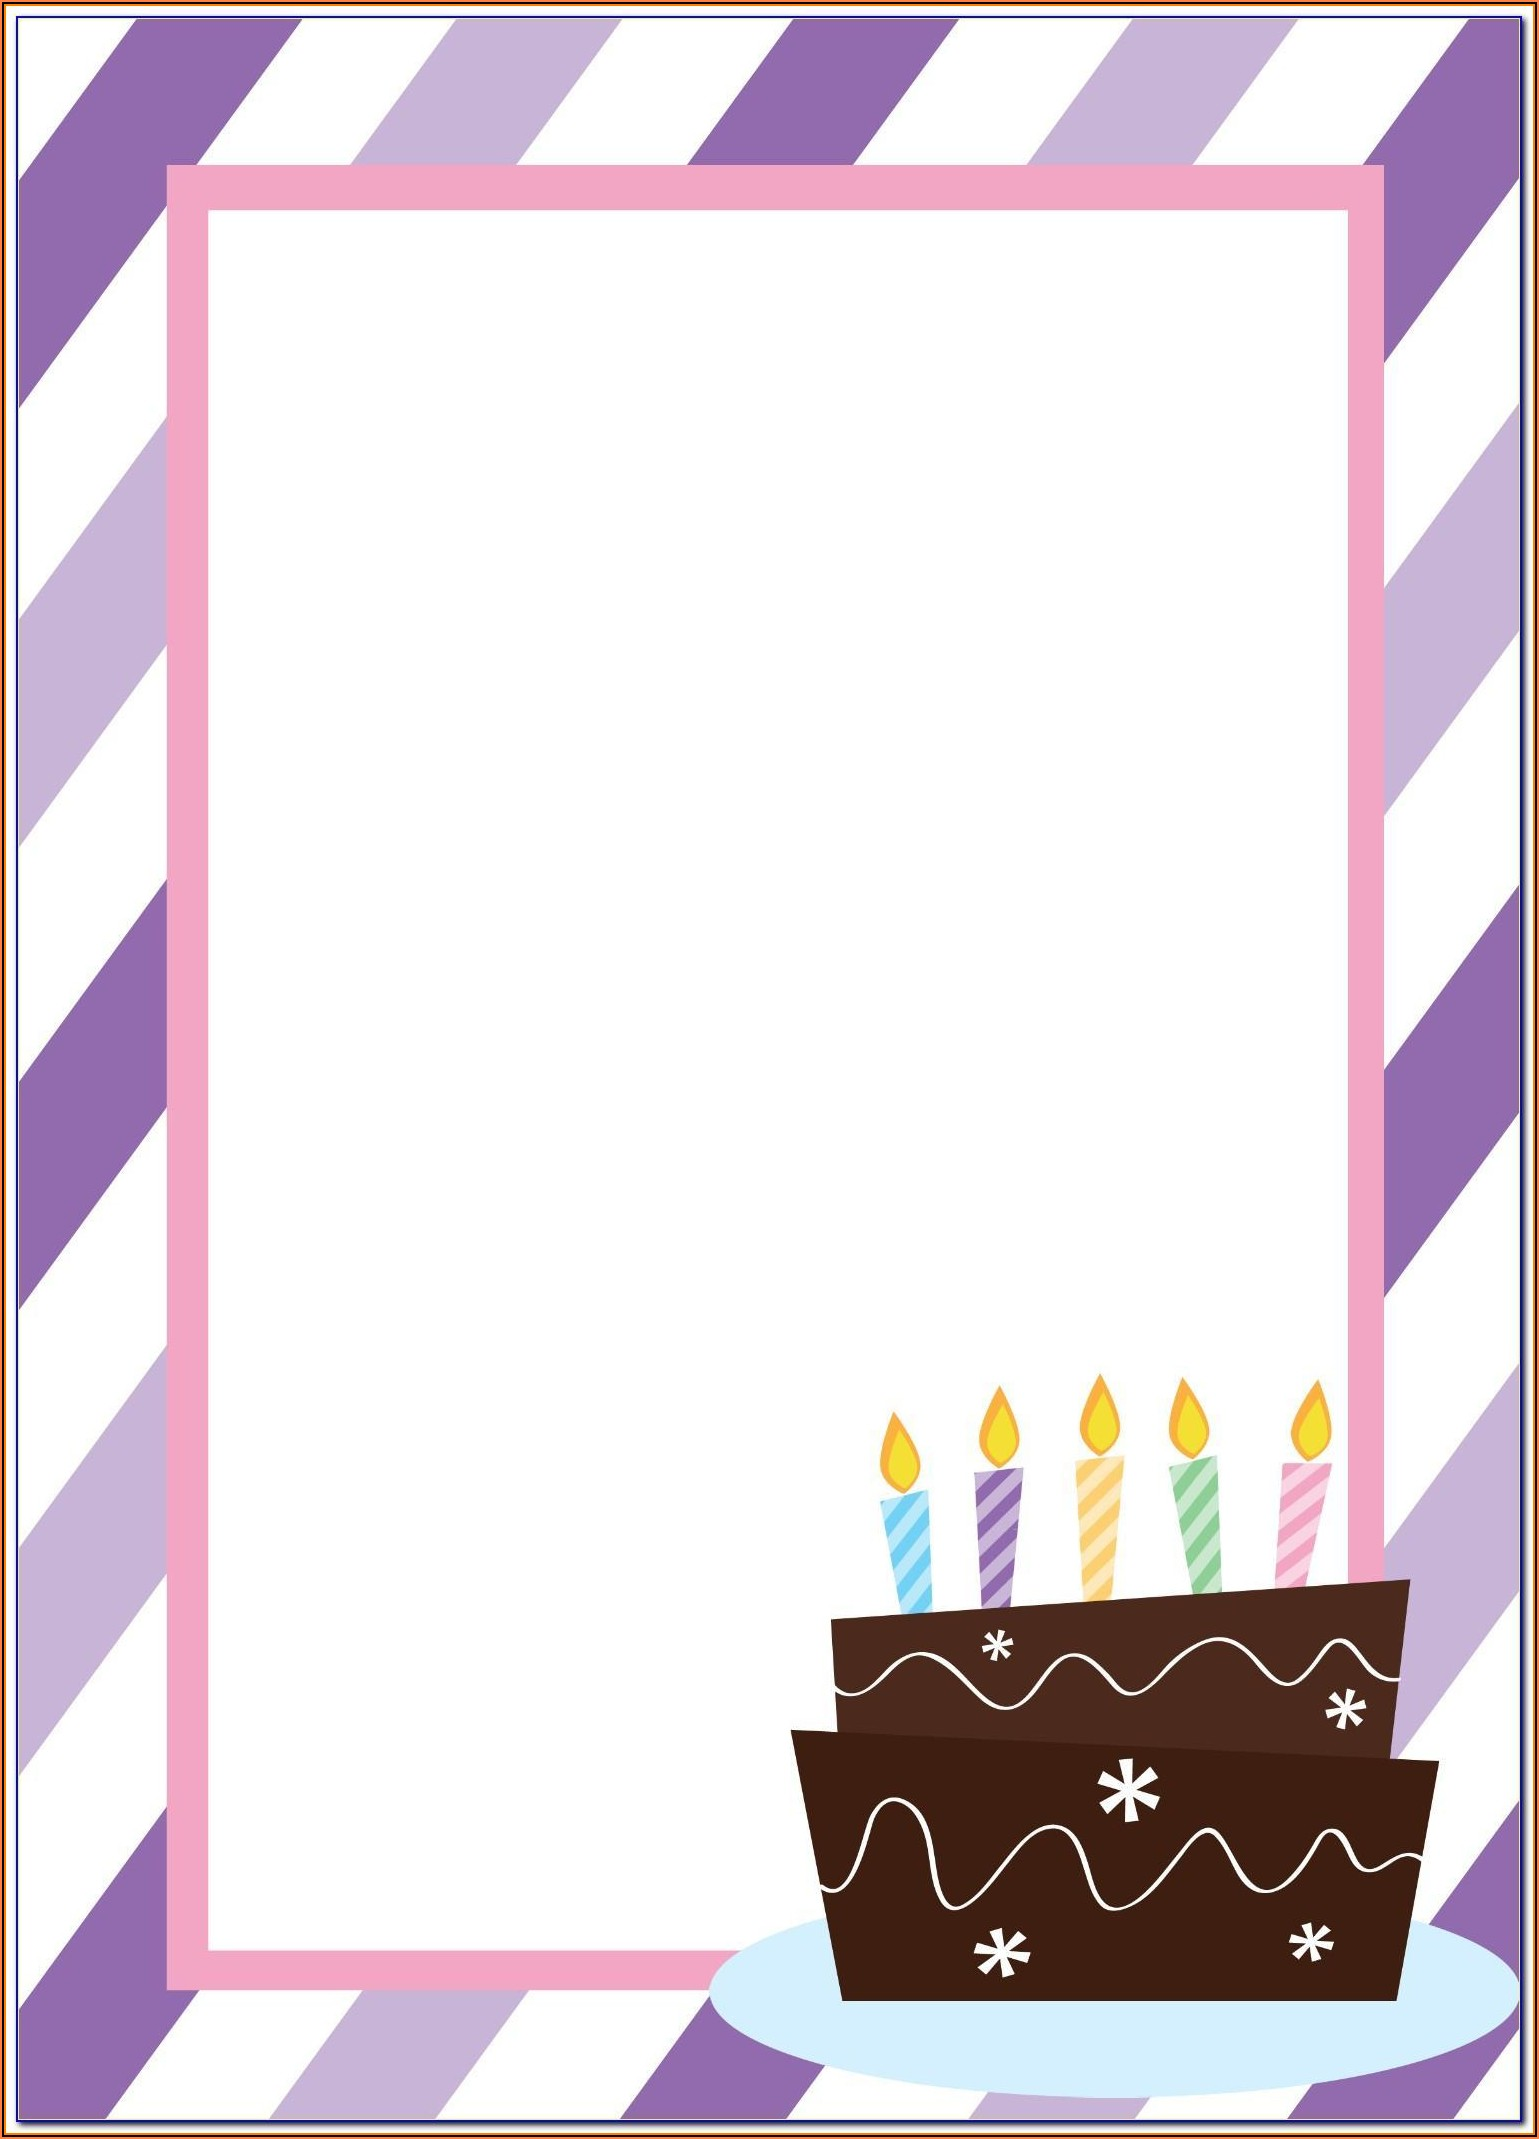 Bumble Bee Birthday Invitation Template Free